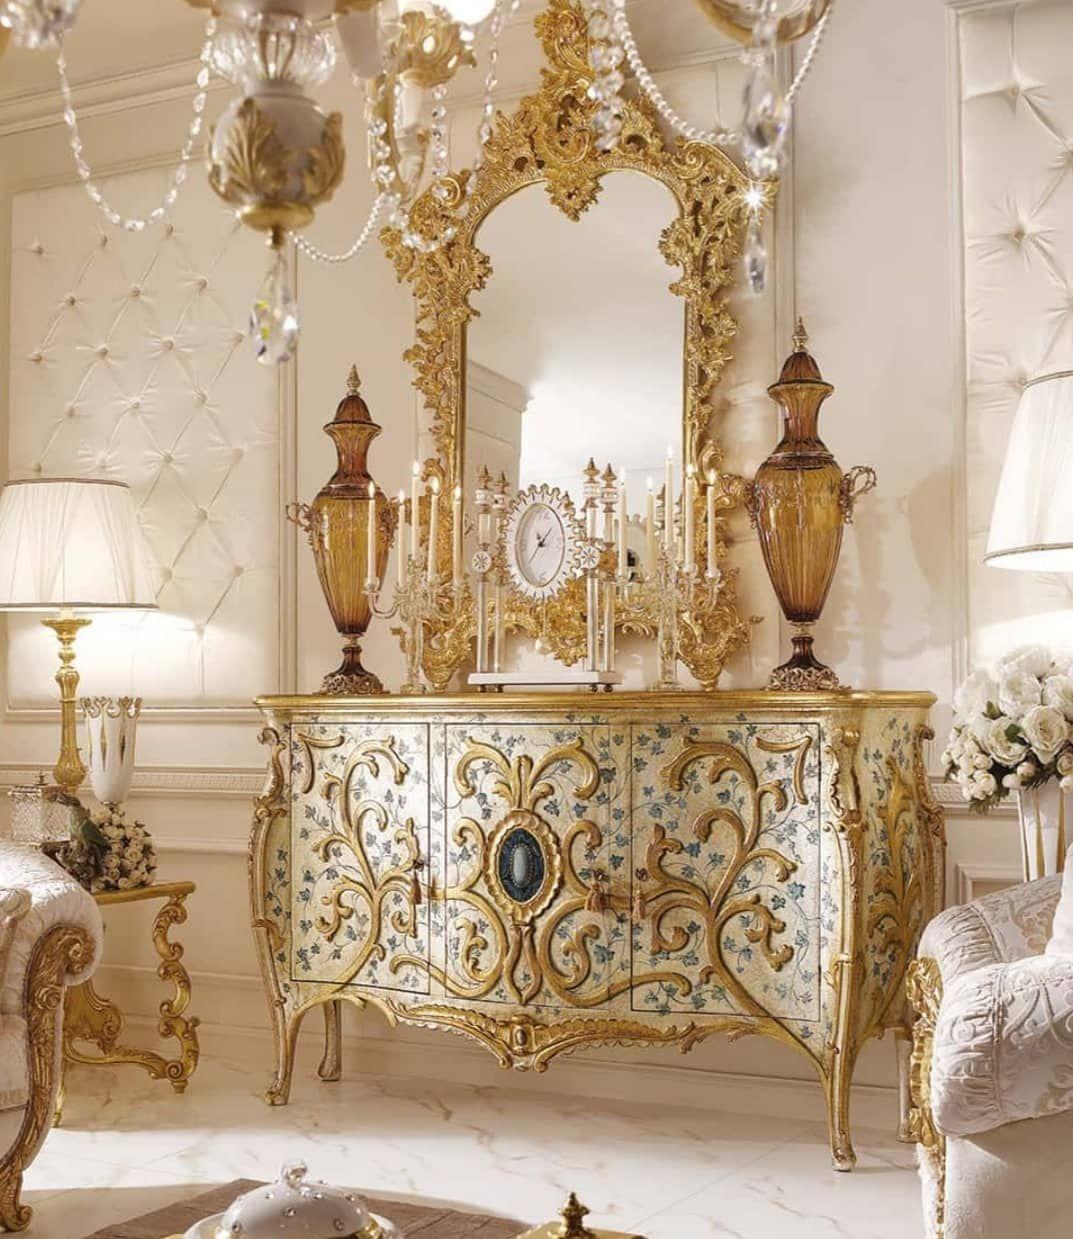 Moriva Mobilya Furniture On Instagram Sofa Furniture Bedrooms Diningroom Dubai Almaty Moskow Irania Luxury Furniture Royal Furniture Classic Dining Room #wooden #living #room #set